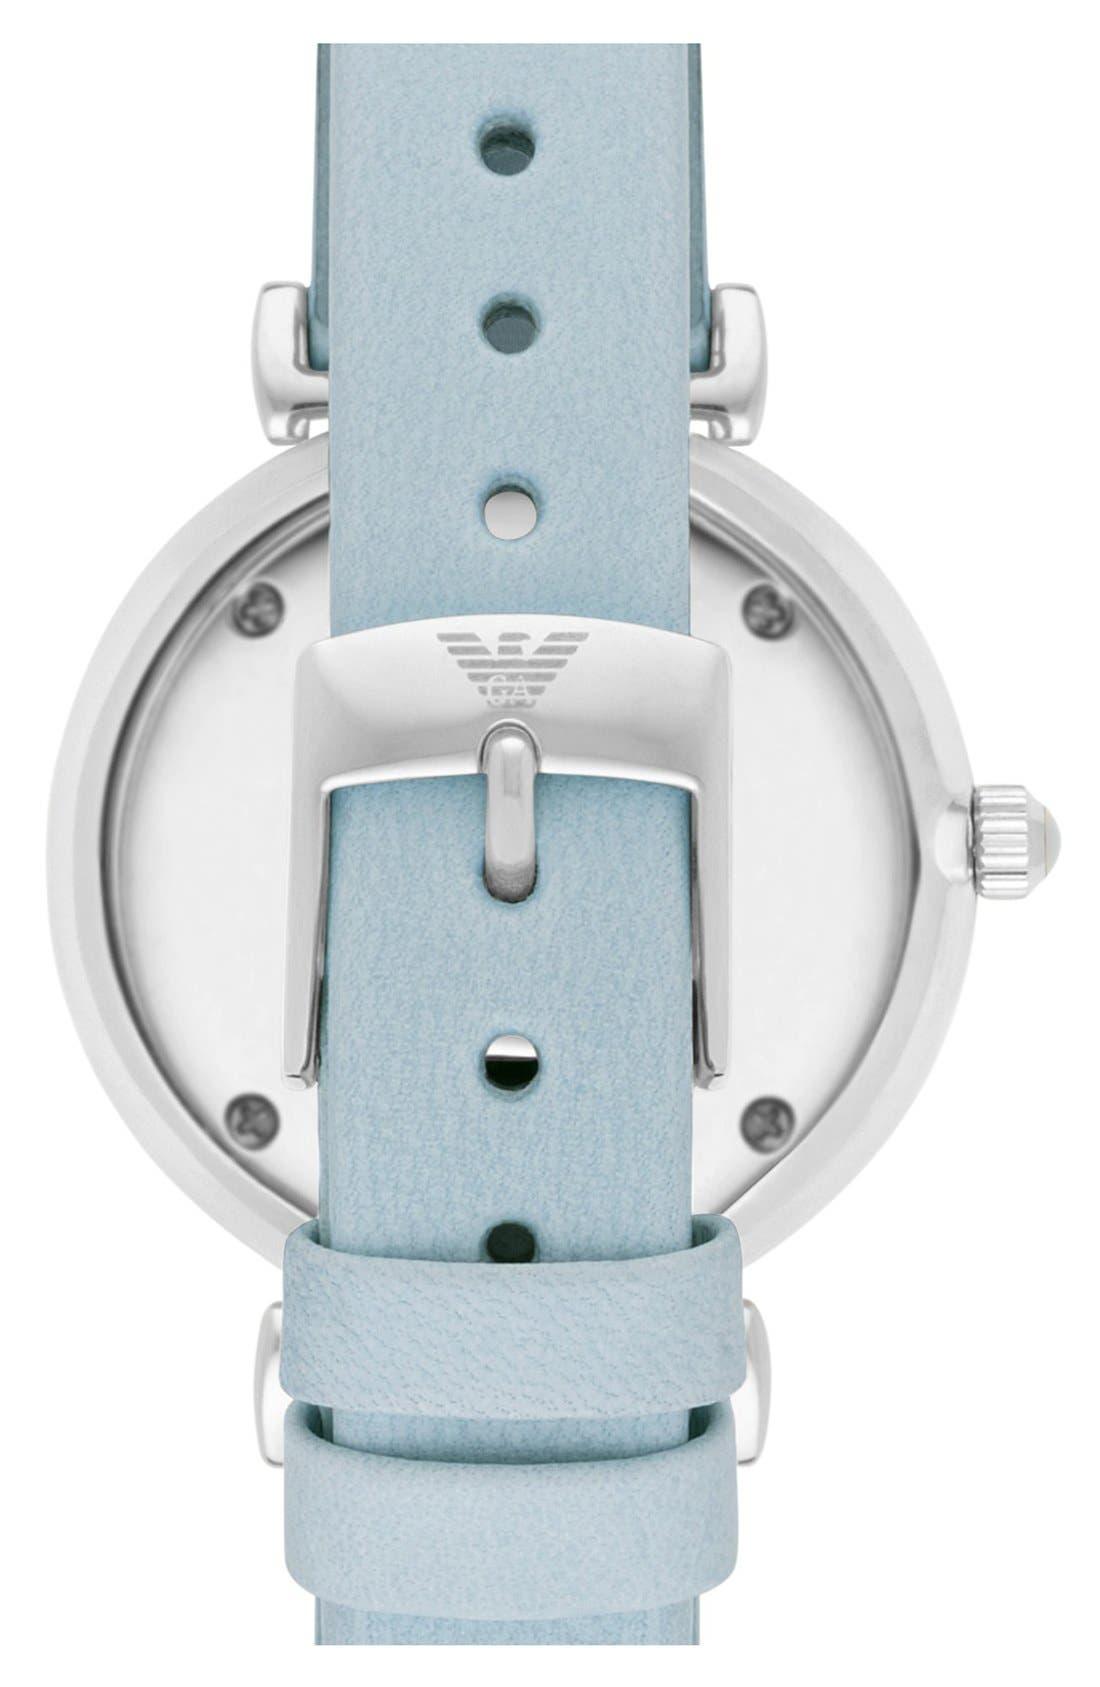 Alternate Image 2  - EmporioArmani 'Retro' Leather Strap Watch, 32mm